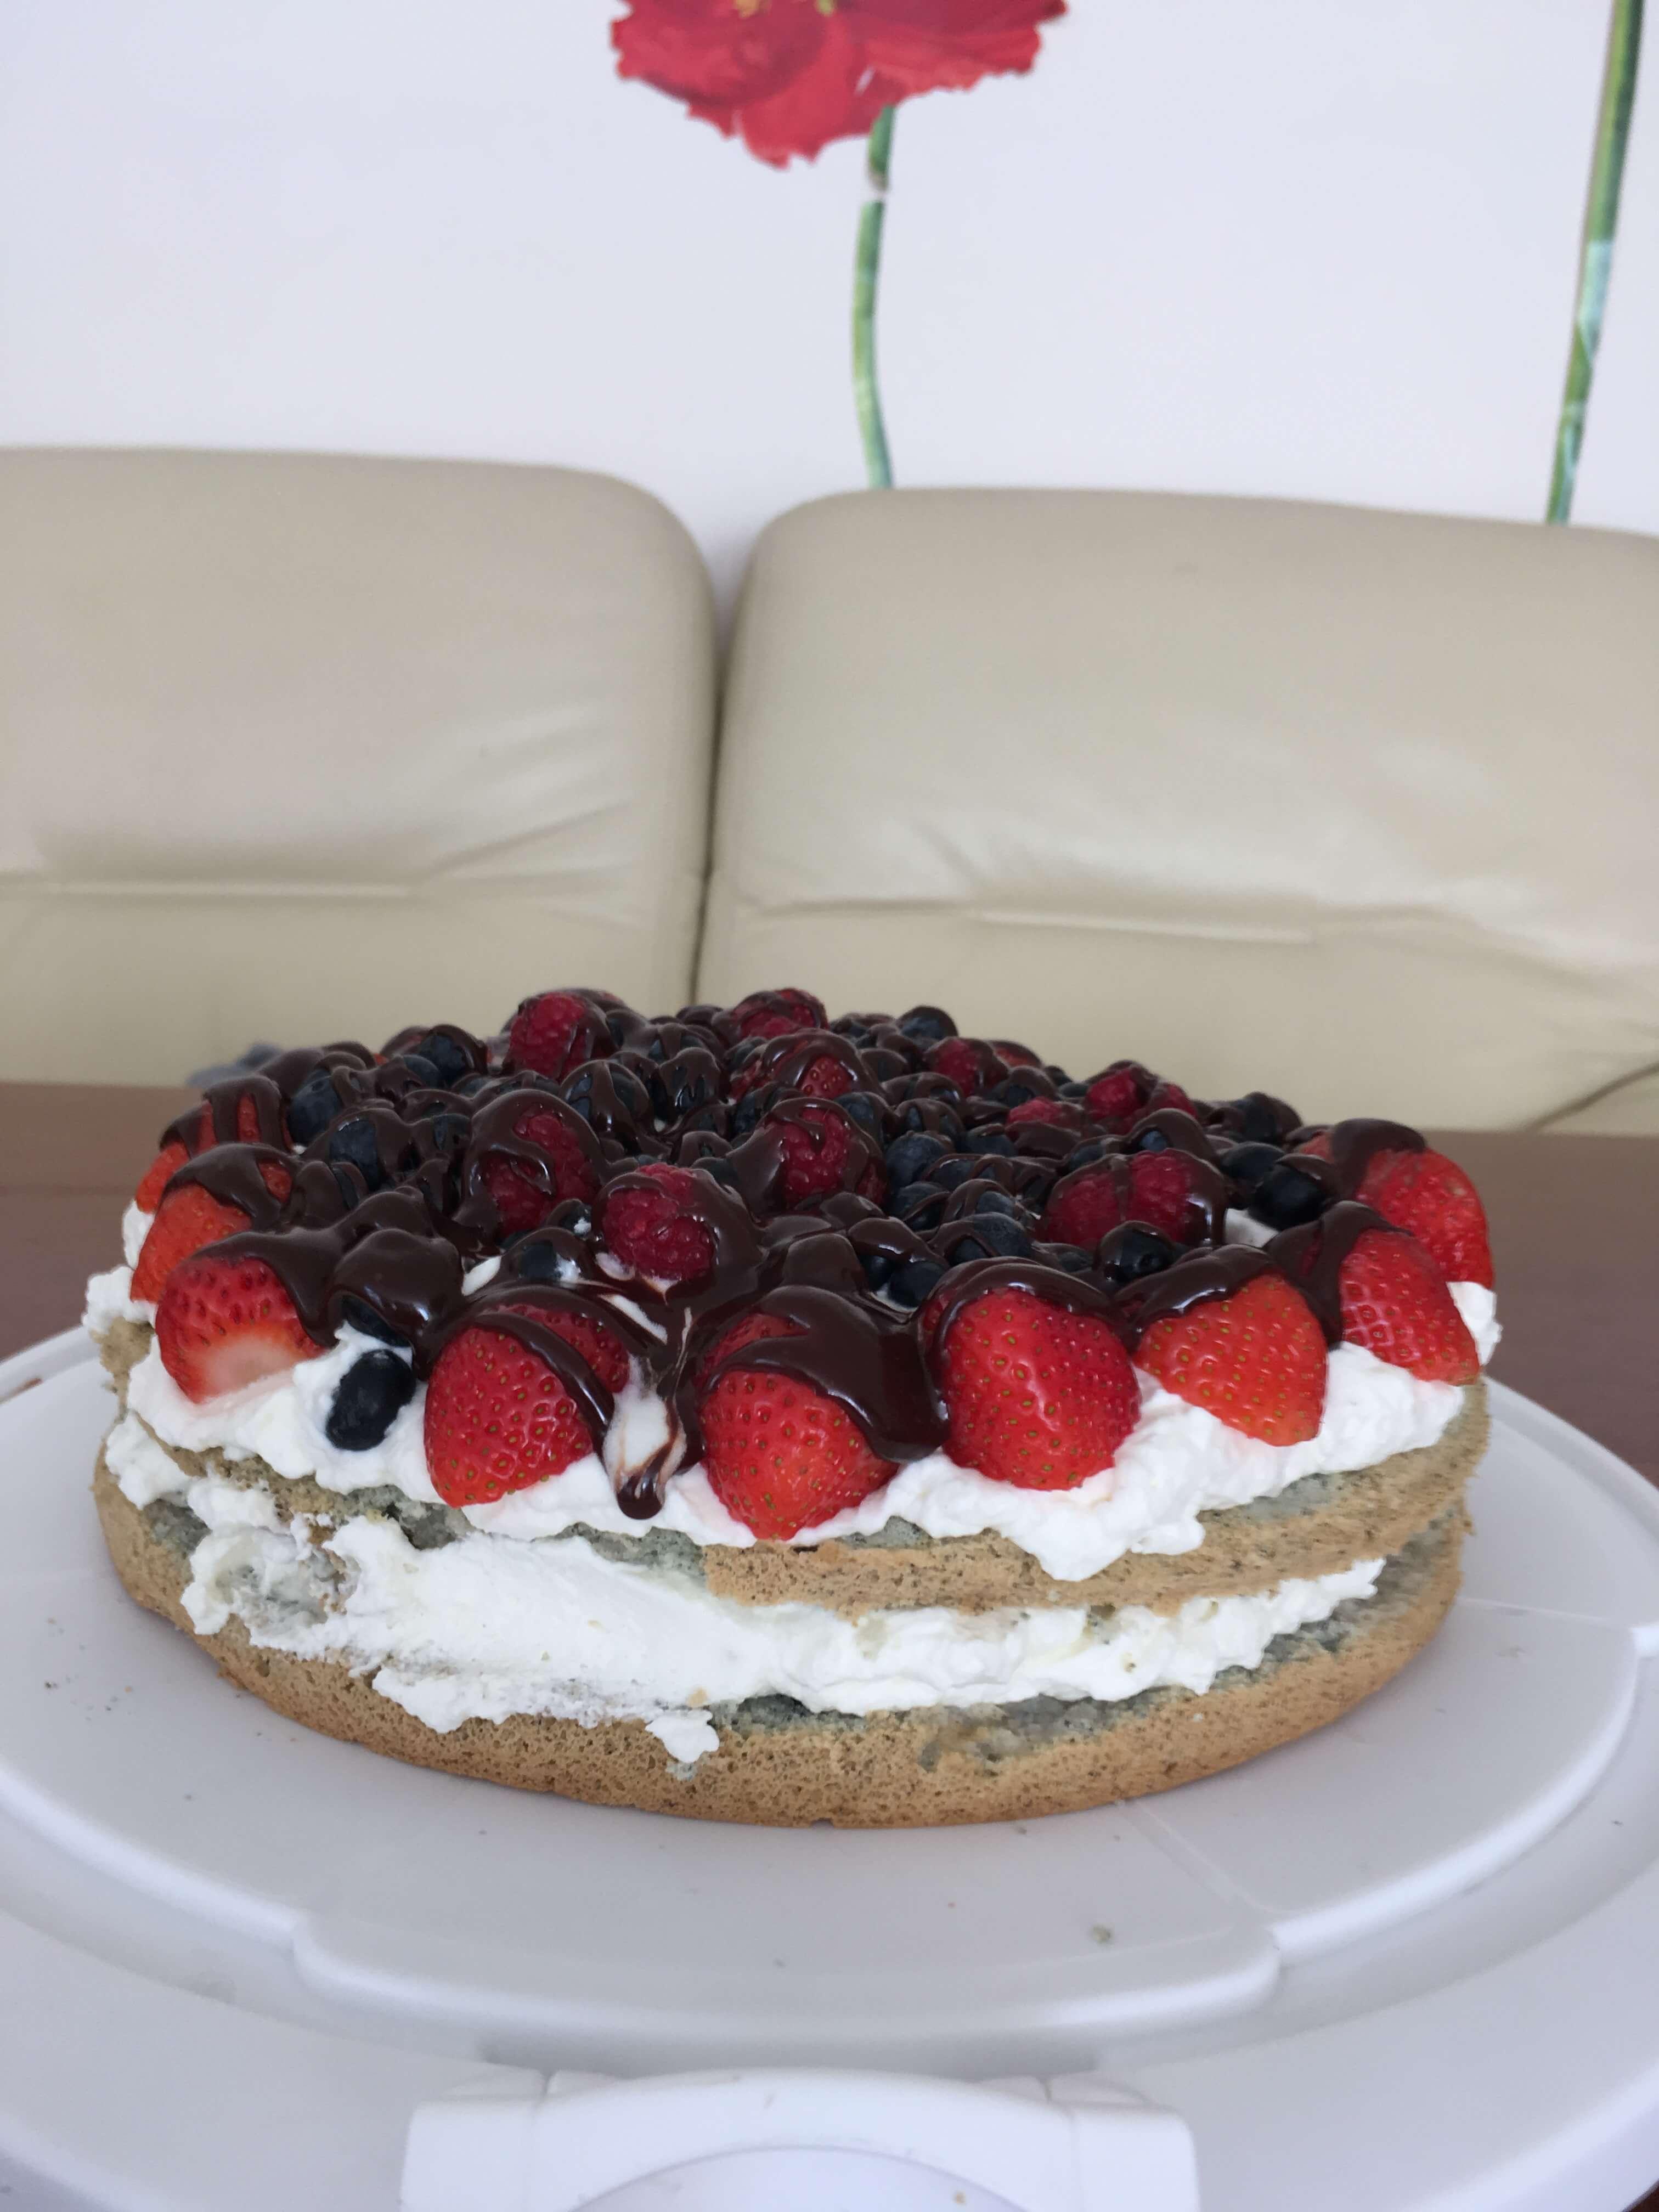 Blue sponge cake with cream and fruit